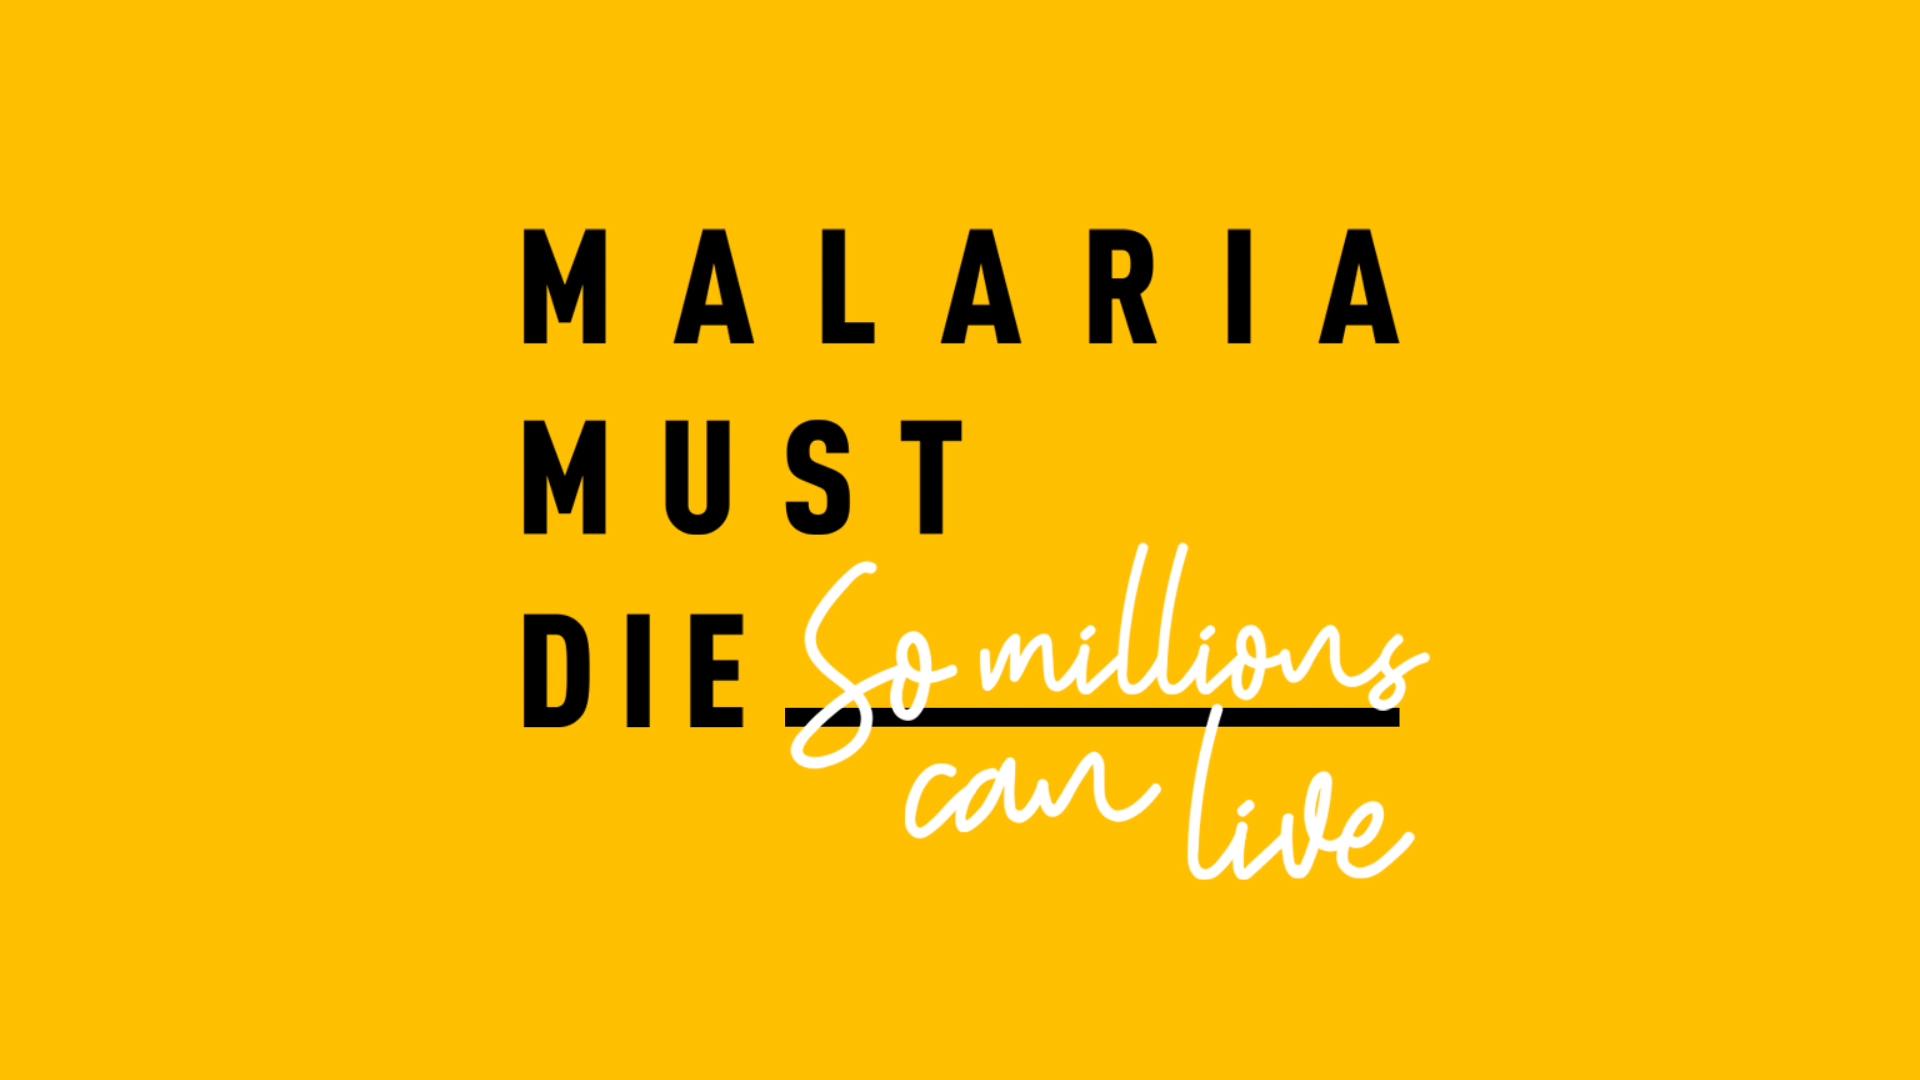 MalariaMustDie_01.jpg